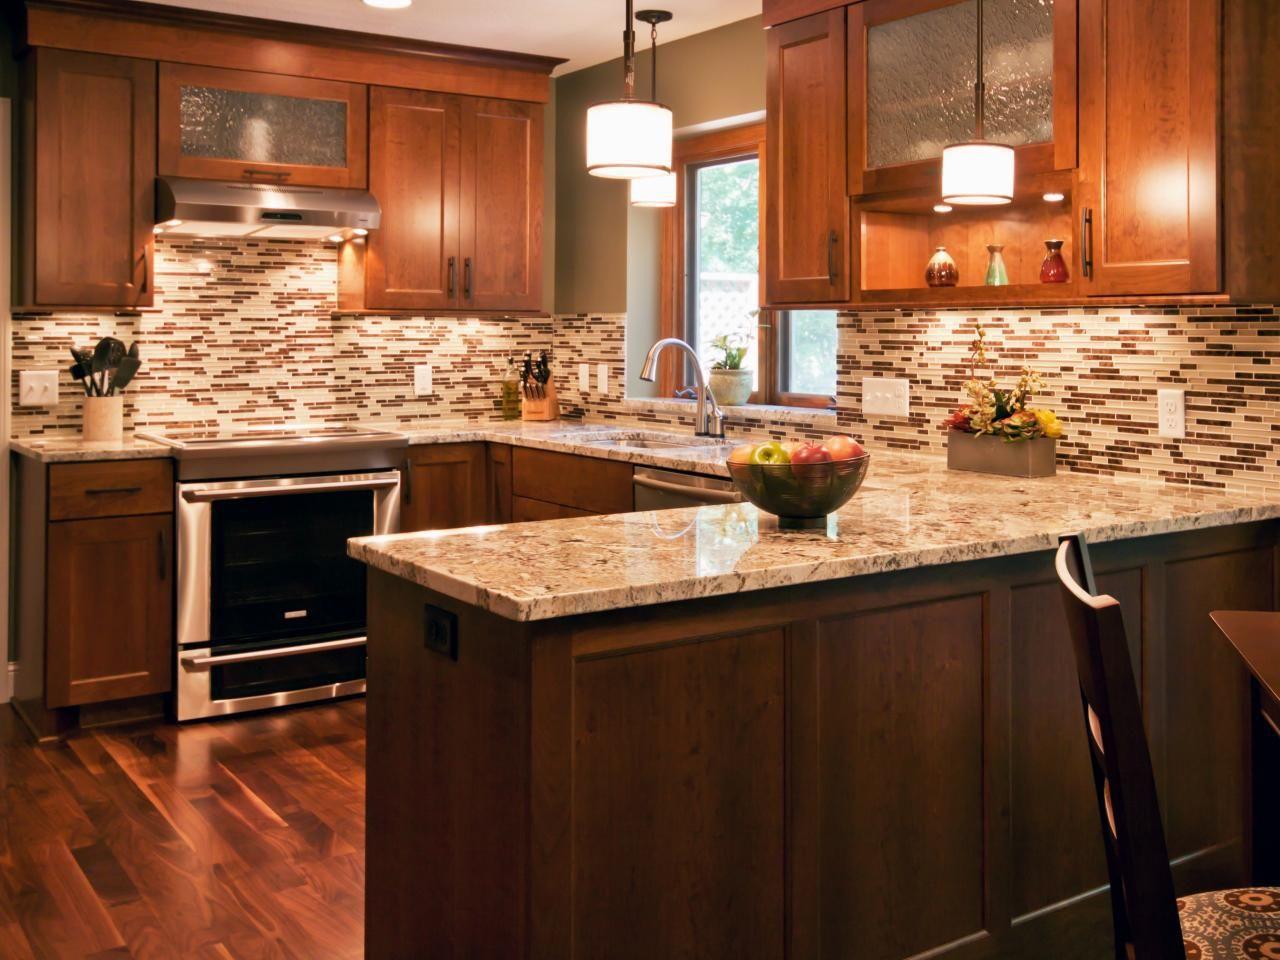 Tile backsplash ideas pictures tips hgtv kitchen ideas details